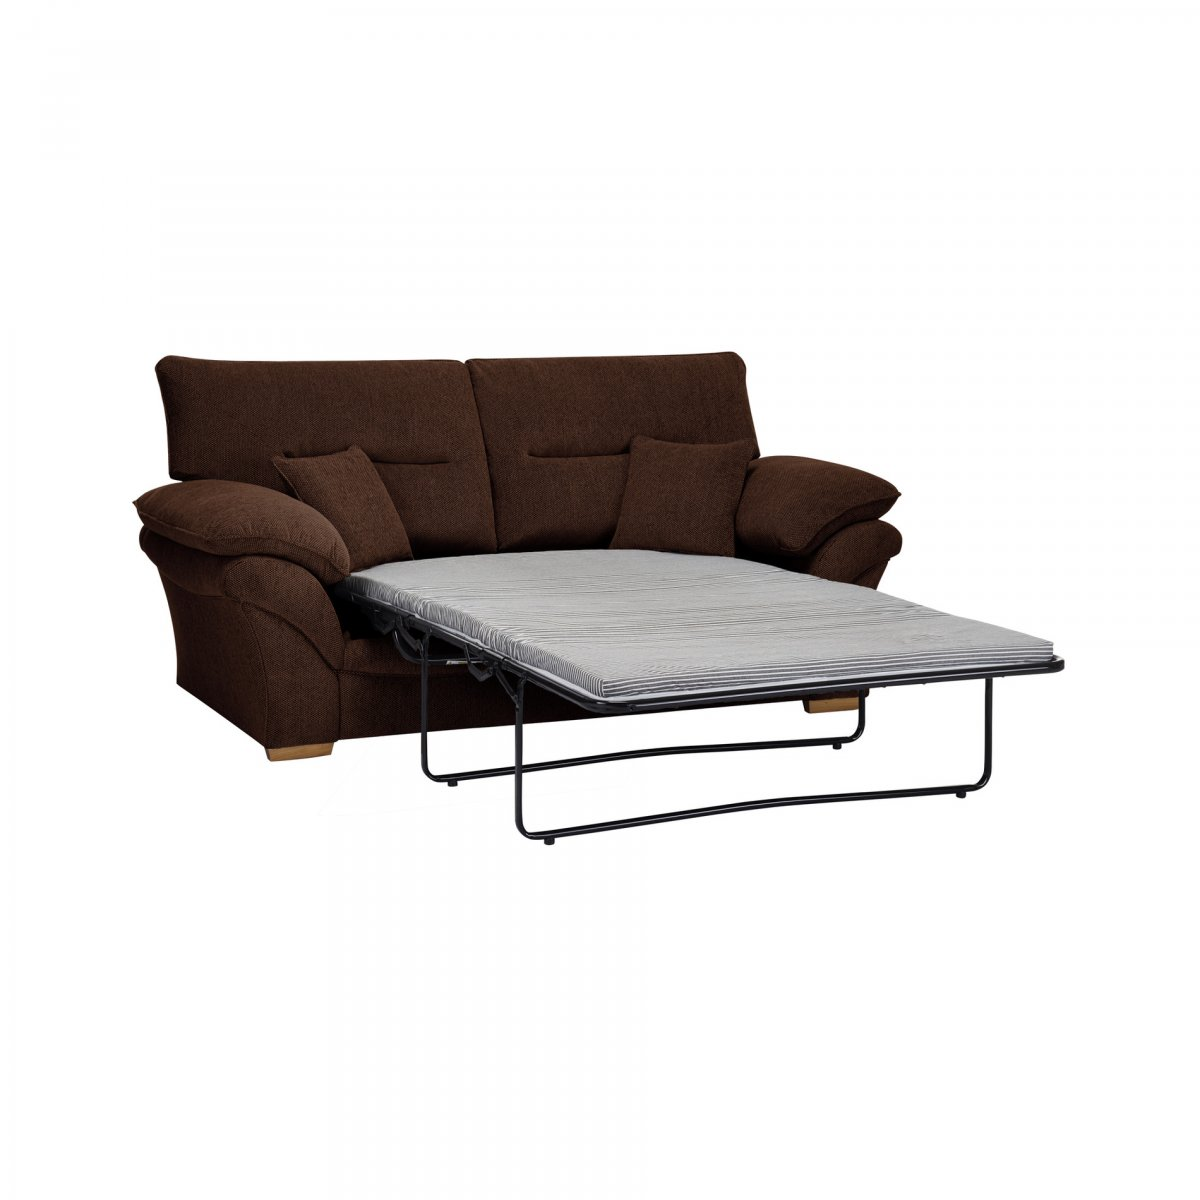 Chloe 2 Seater Standard Sofa Bed In Brown Fabric